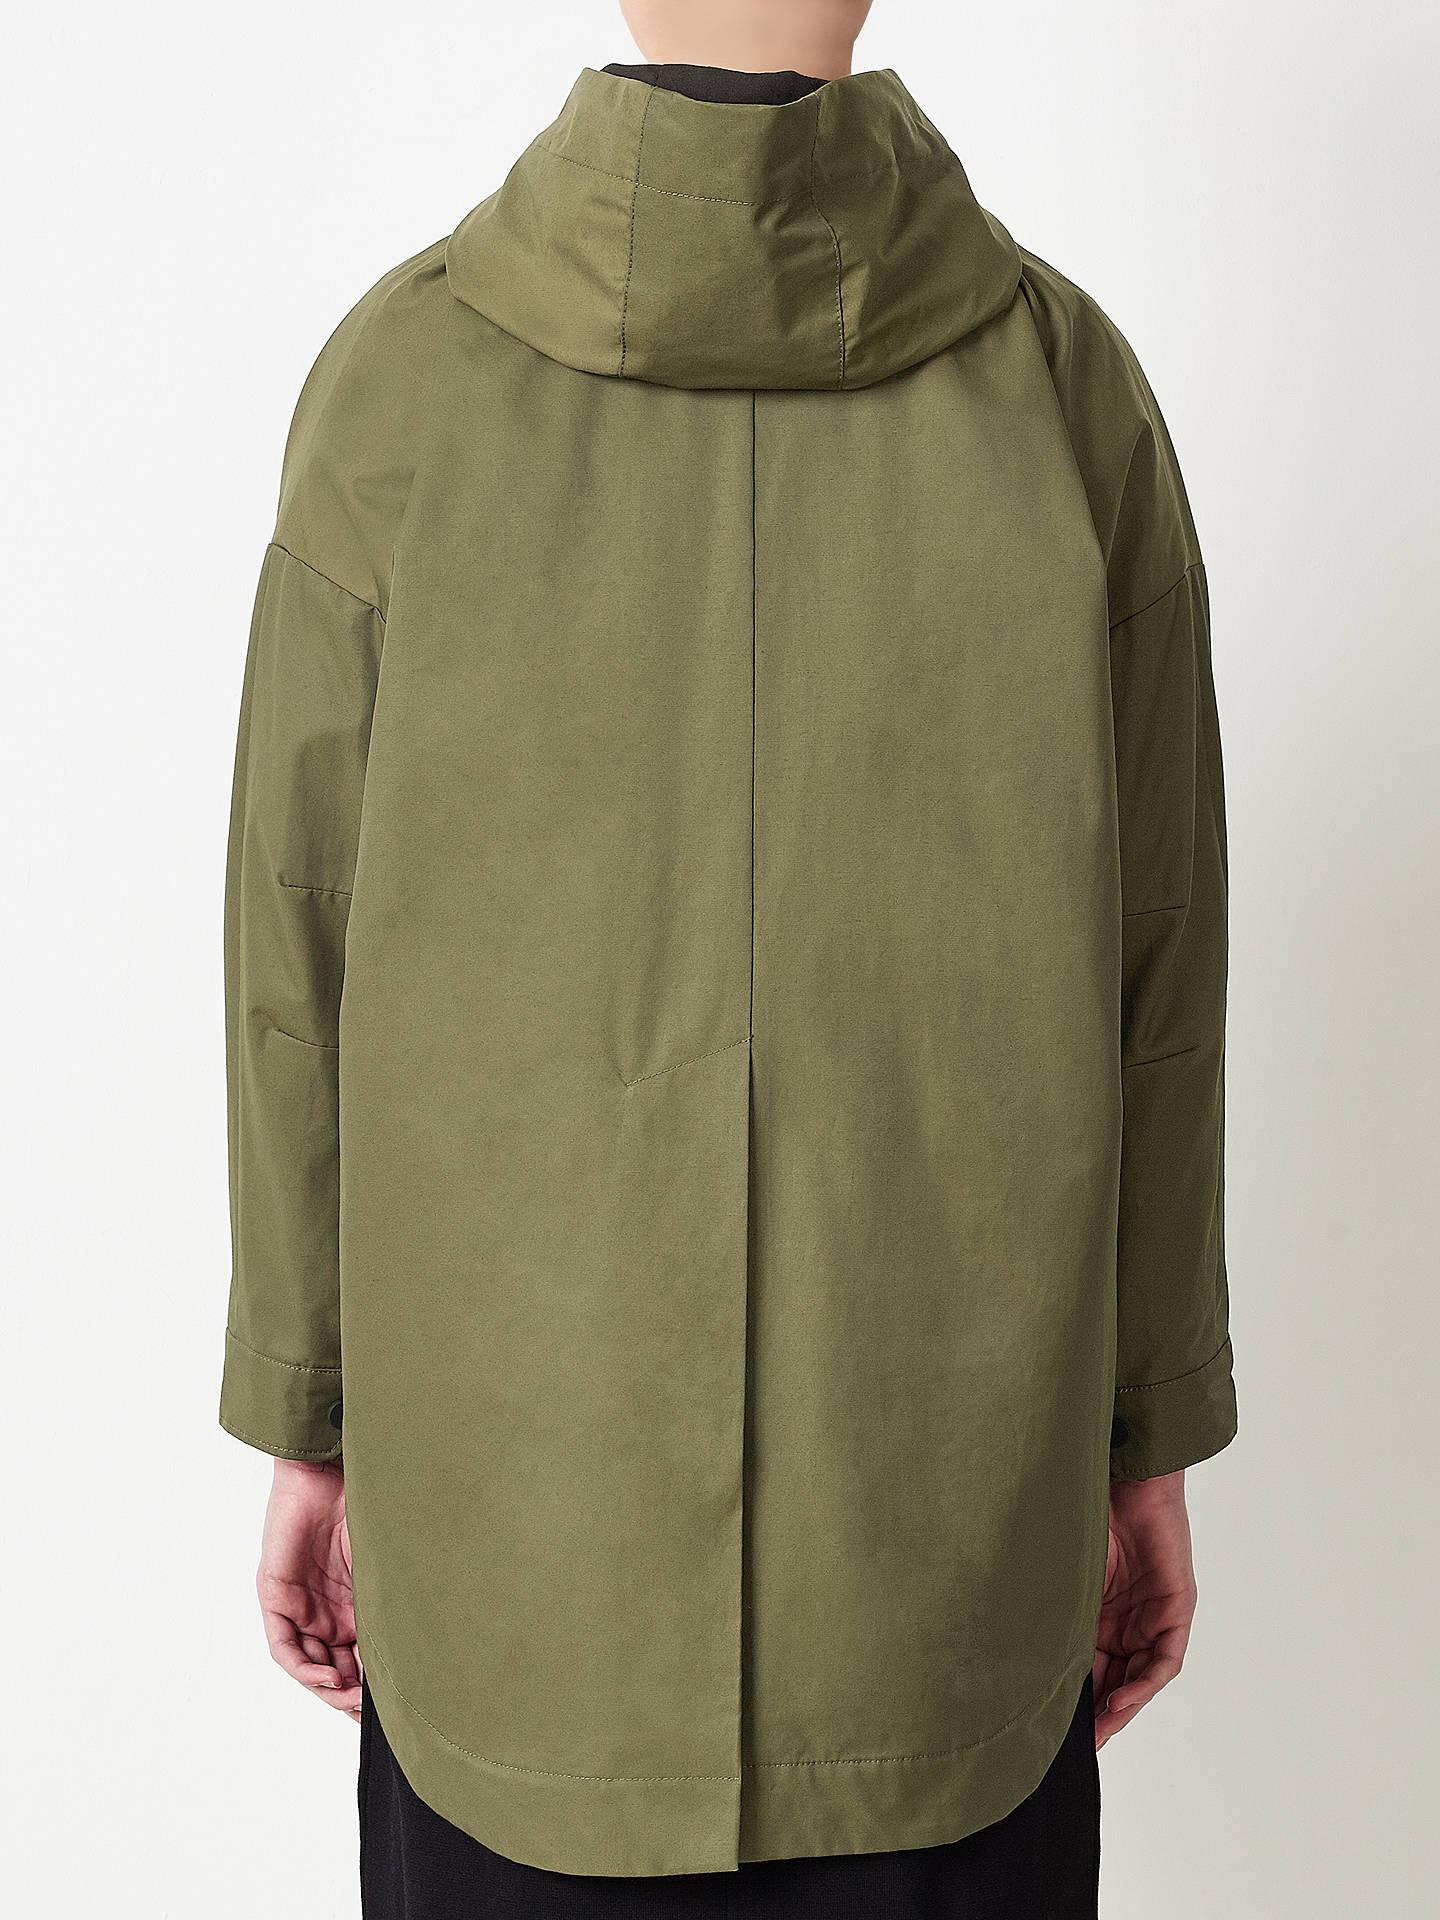 size 40 2ecdc 92a5e Kin by John Lewis Parka Coat, Khaki at John Lewis & Partners